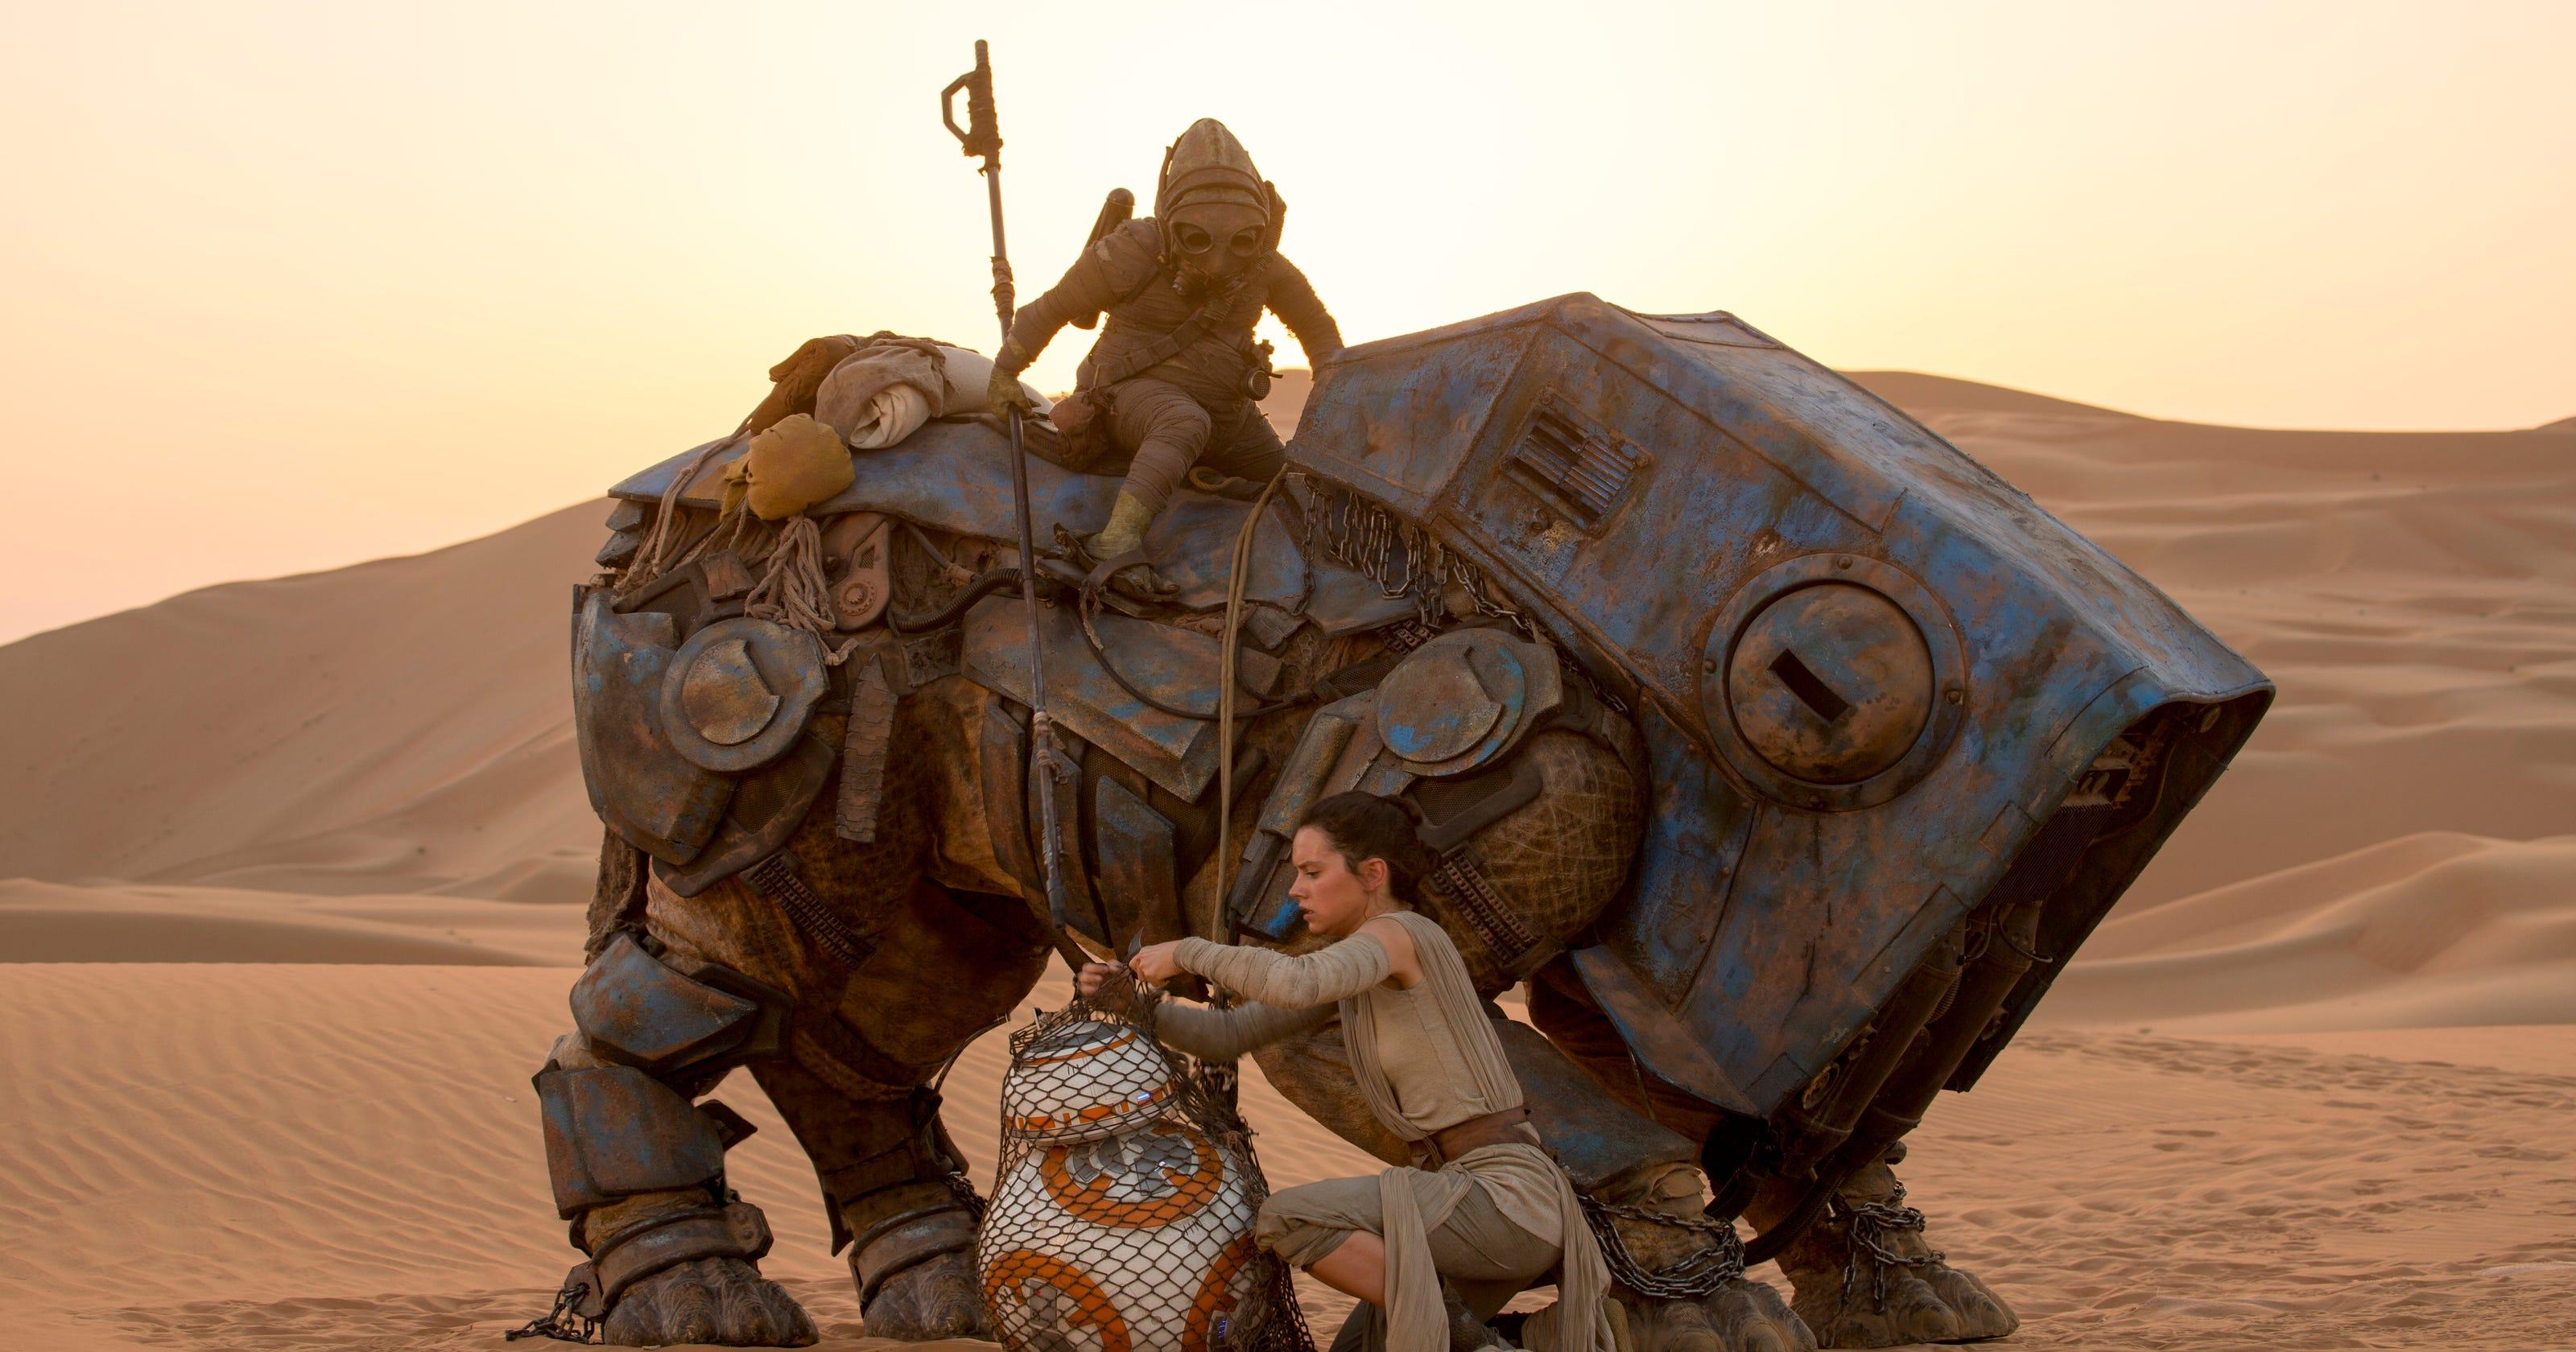 SPOILER ALERT! Five biggest 'Star Wars: The Force Awakens